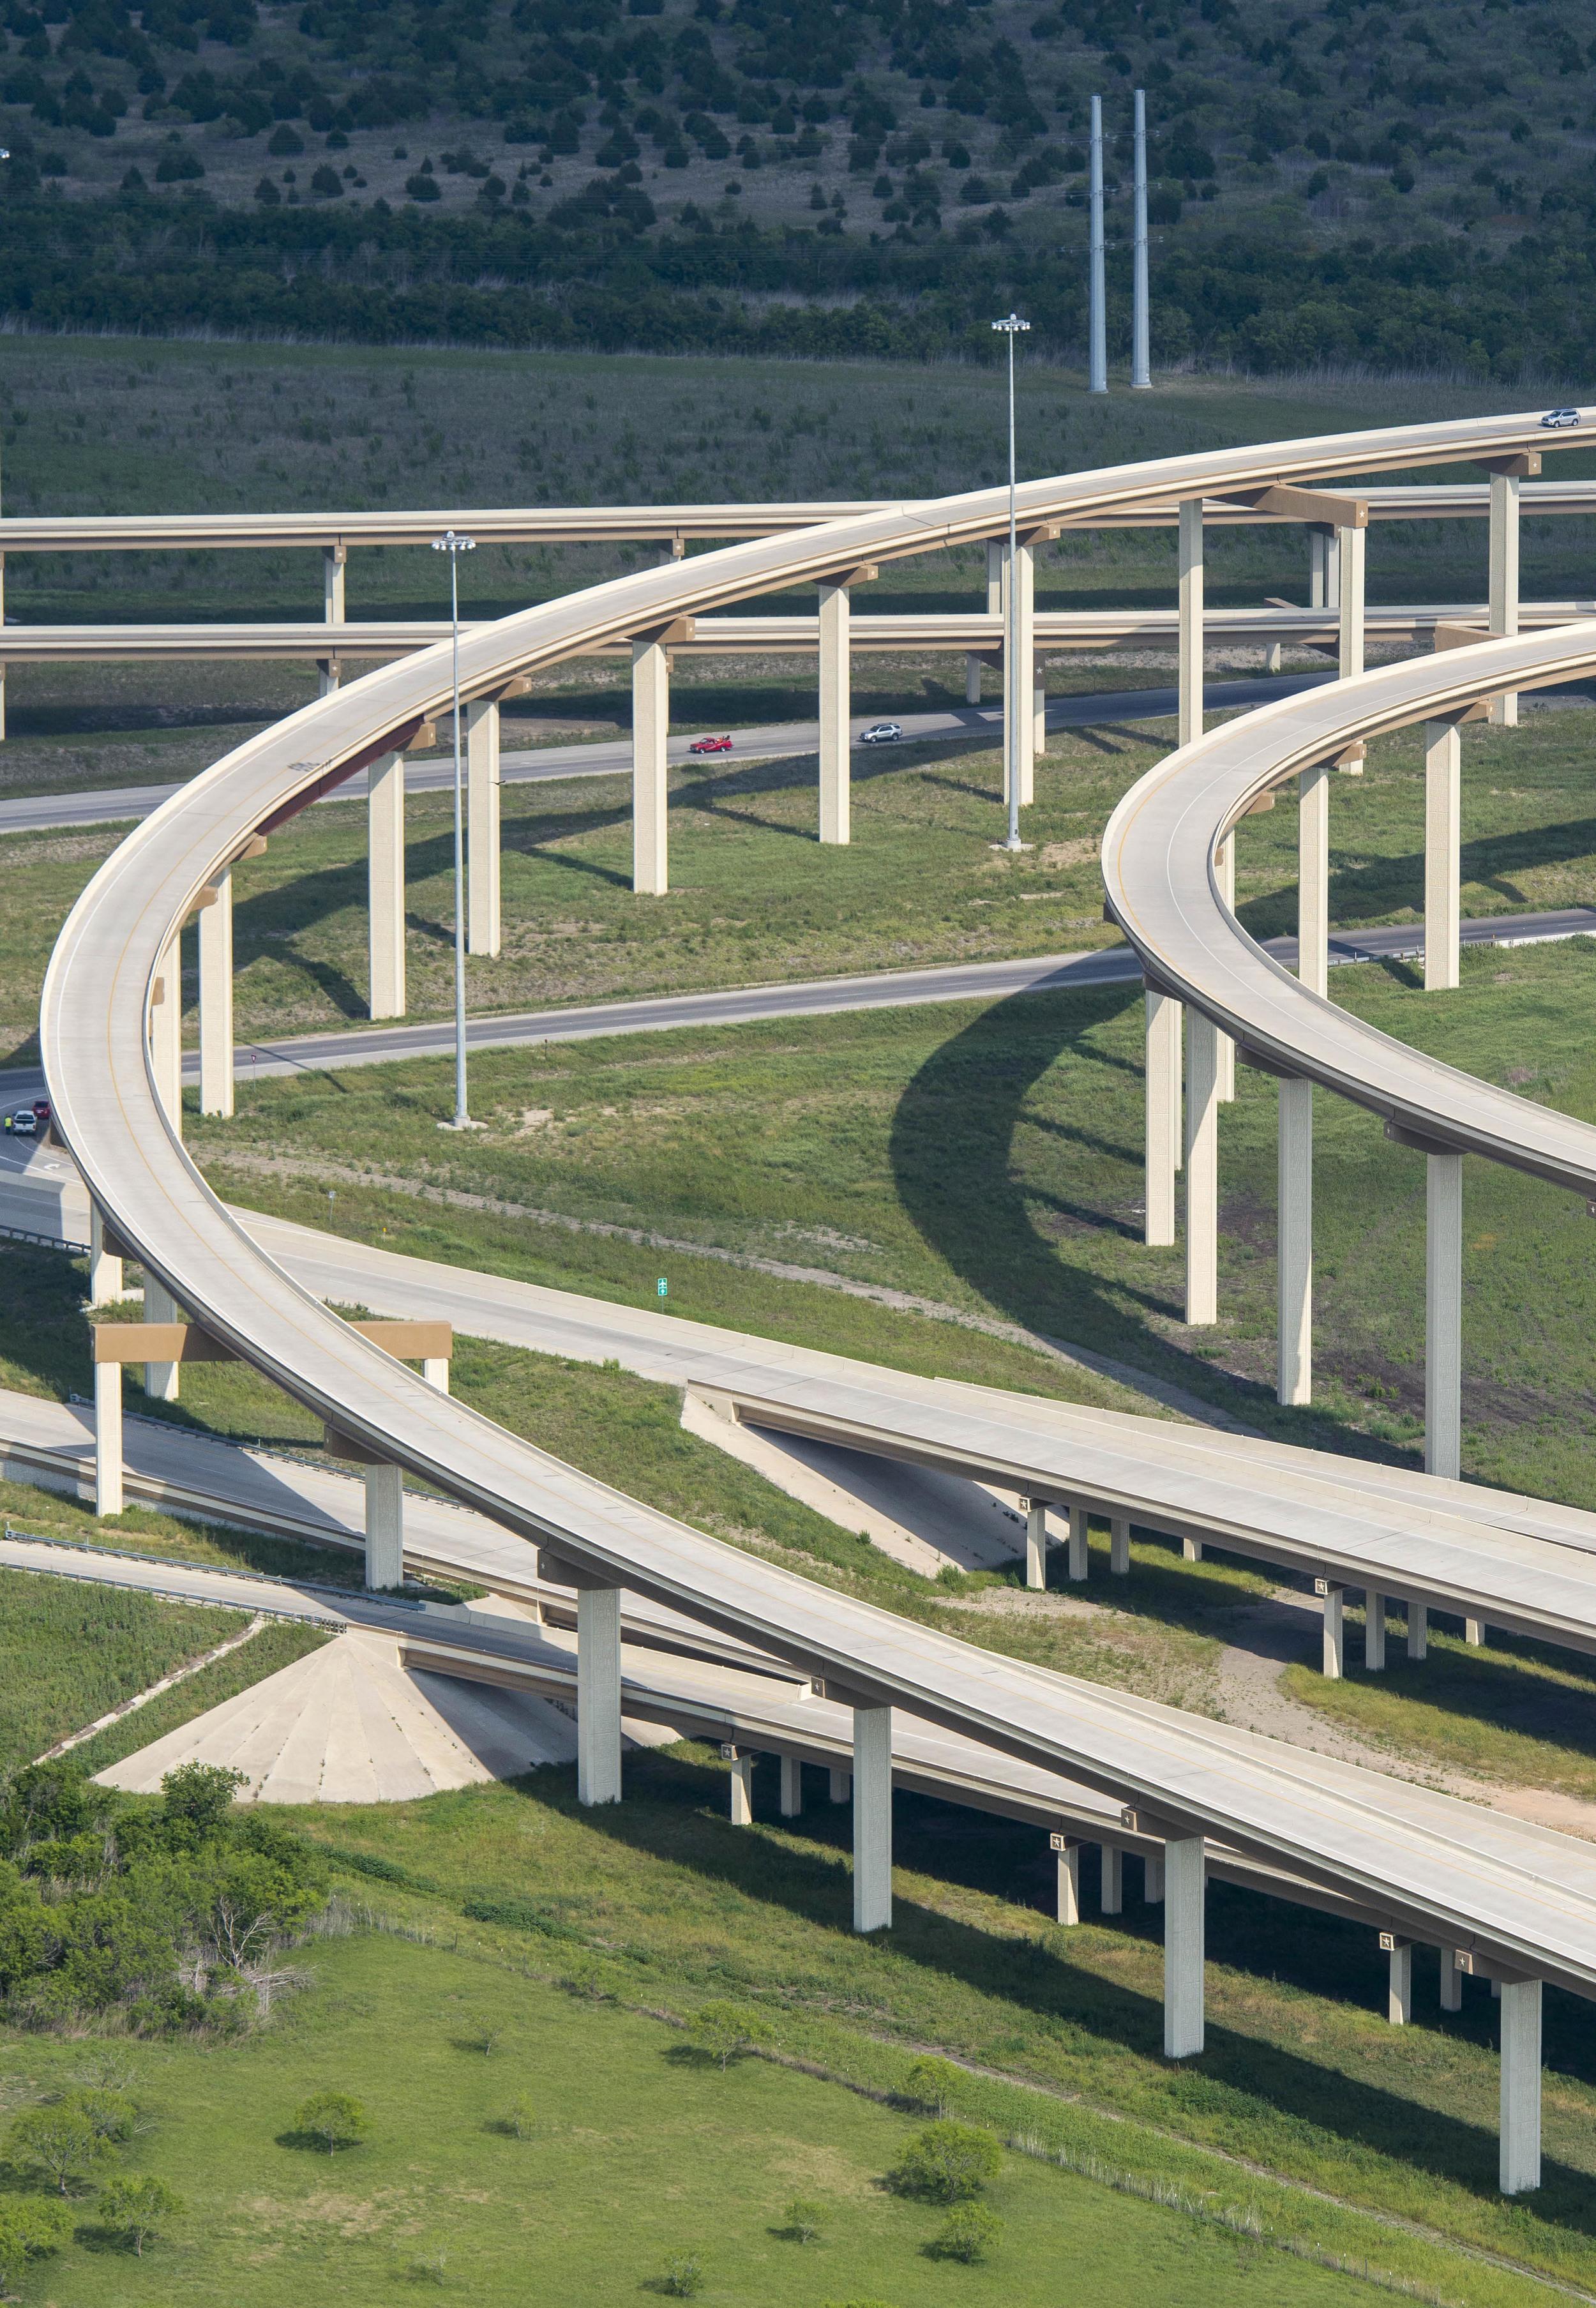 Texas_HWY_130_Toll_Road_201305_11.jpg